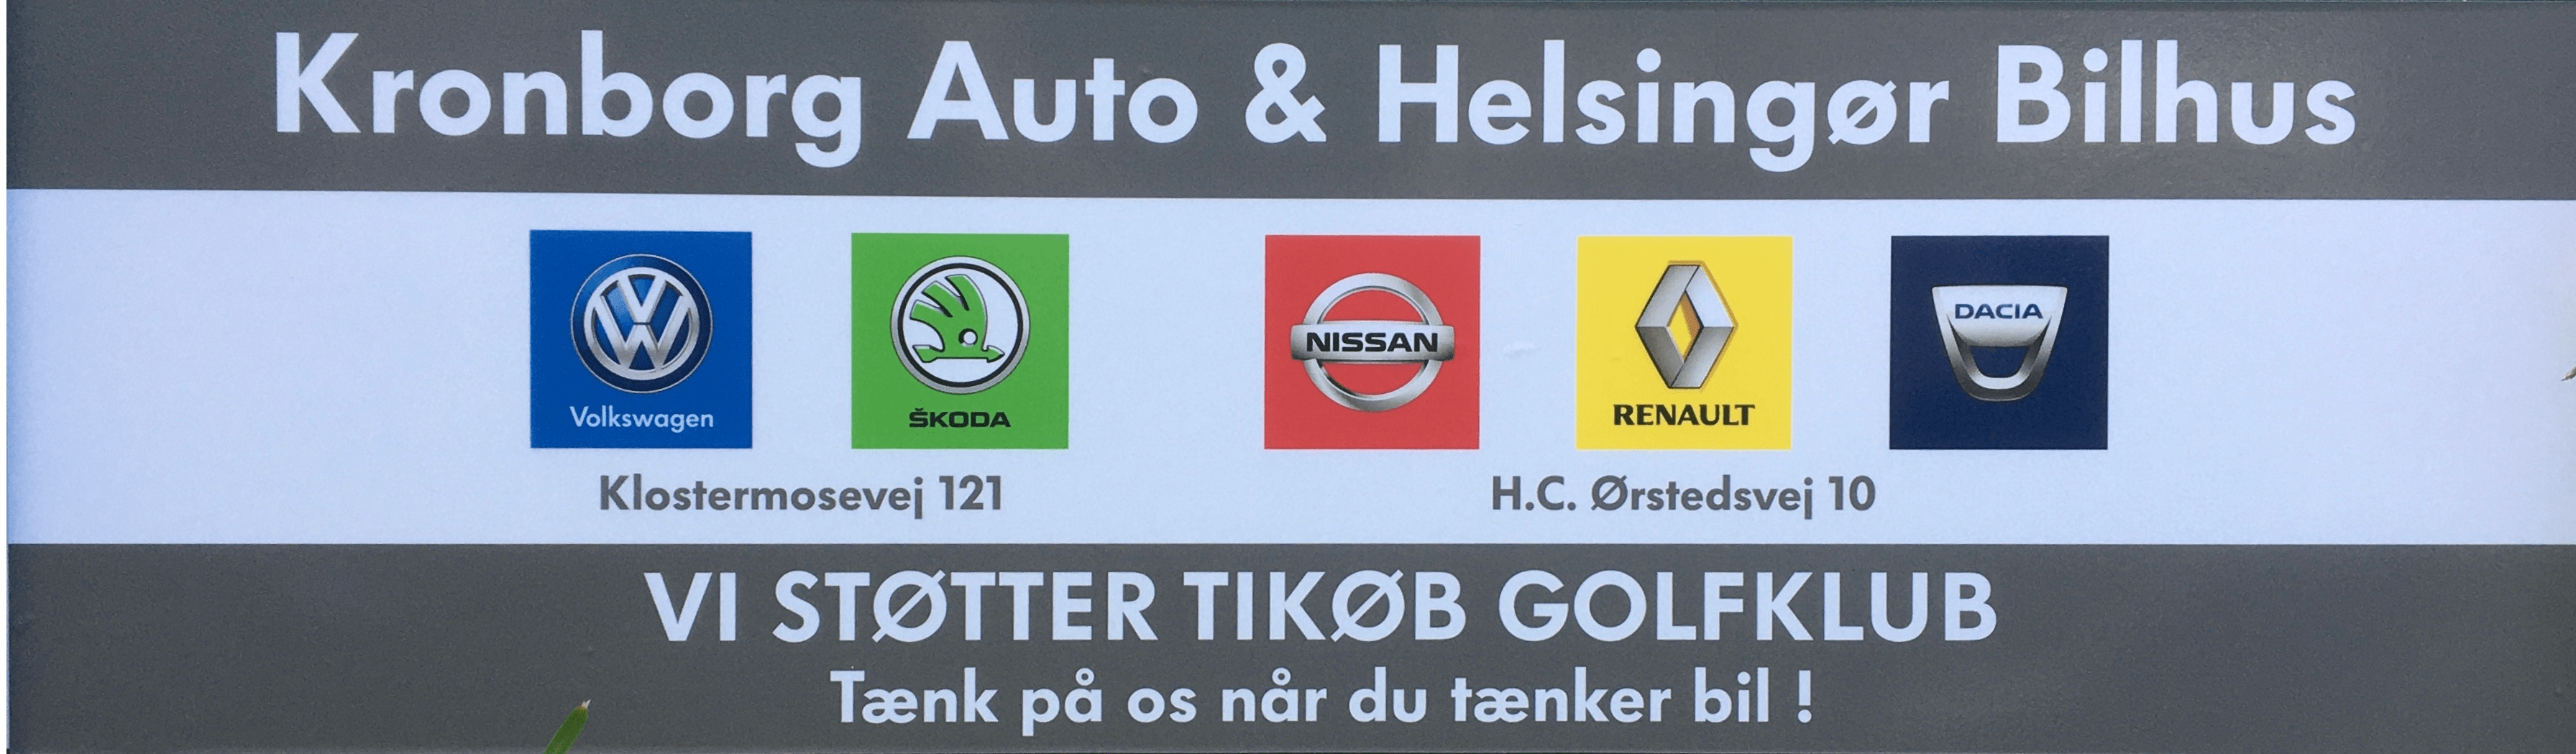 Kronborg Auto & Helsingør Bilhus